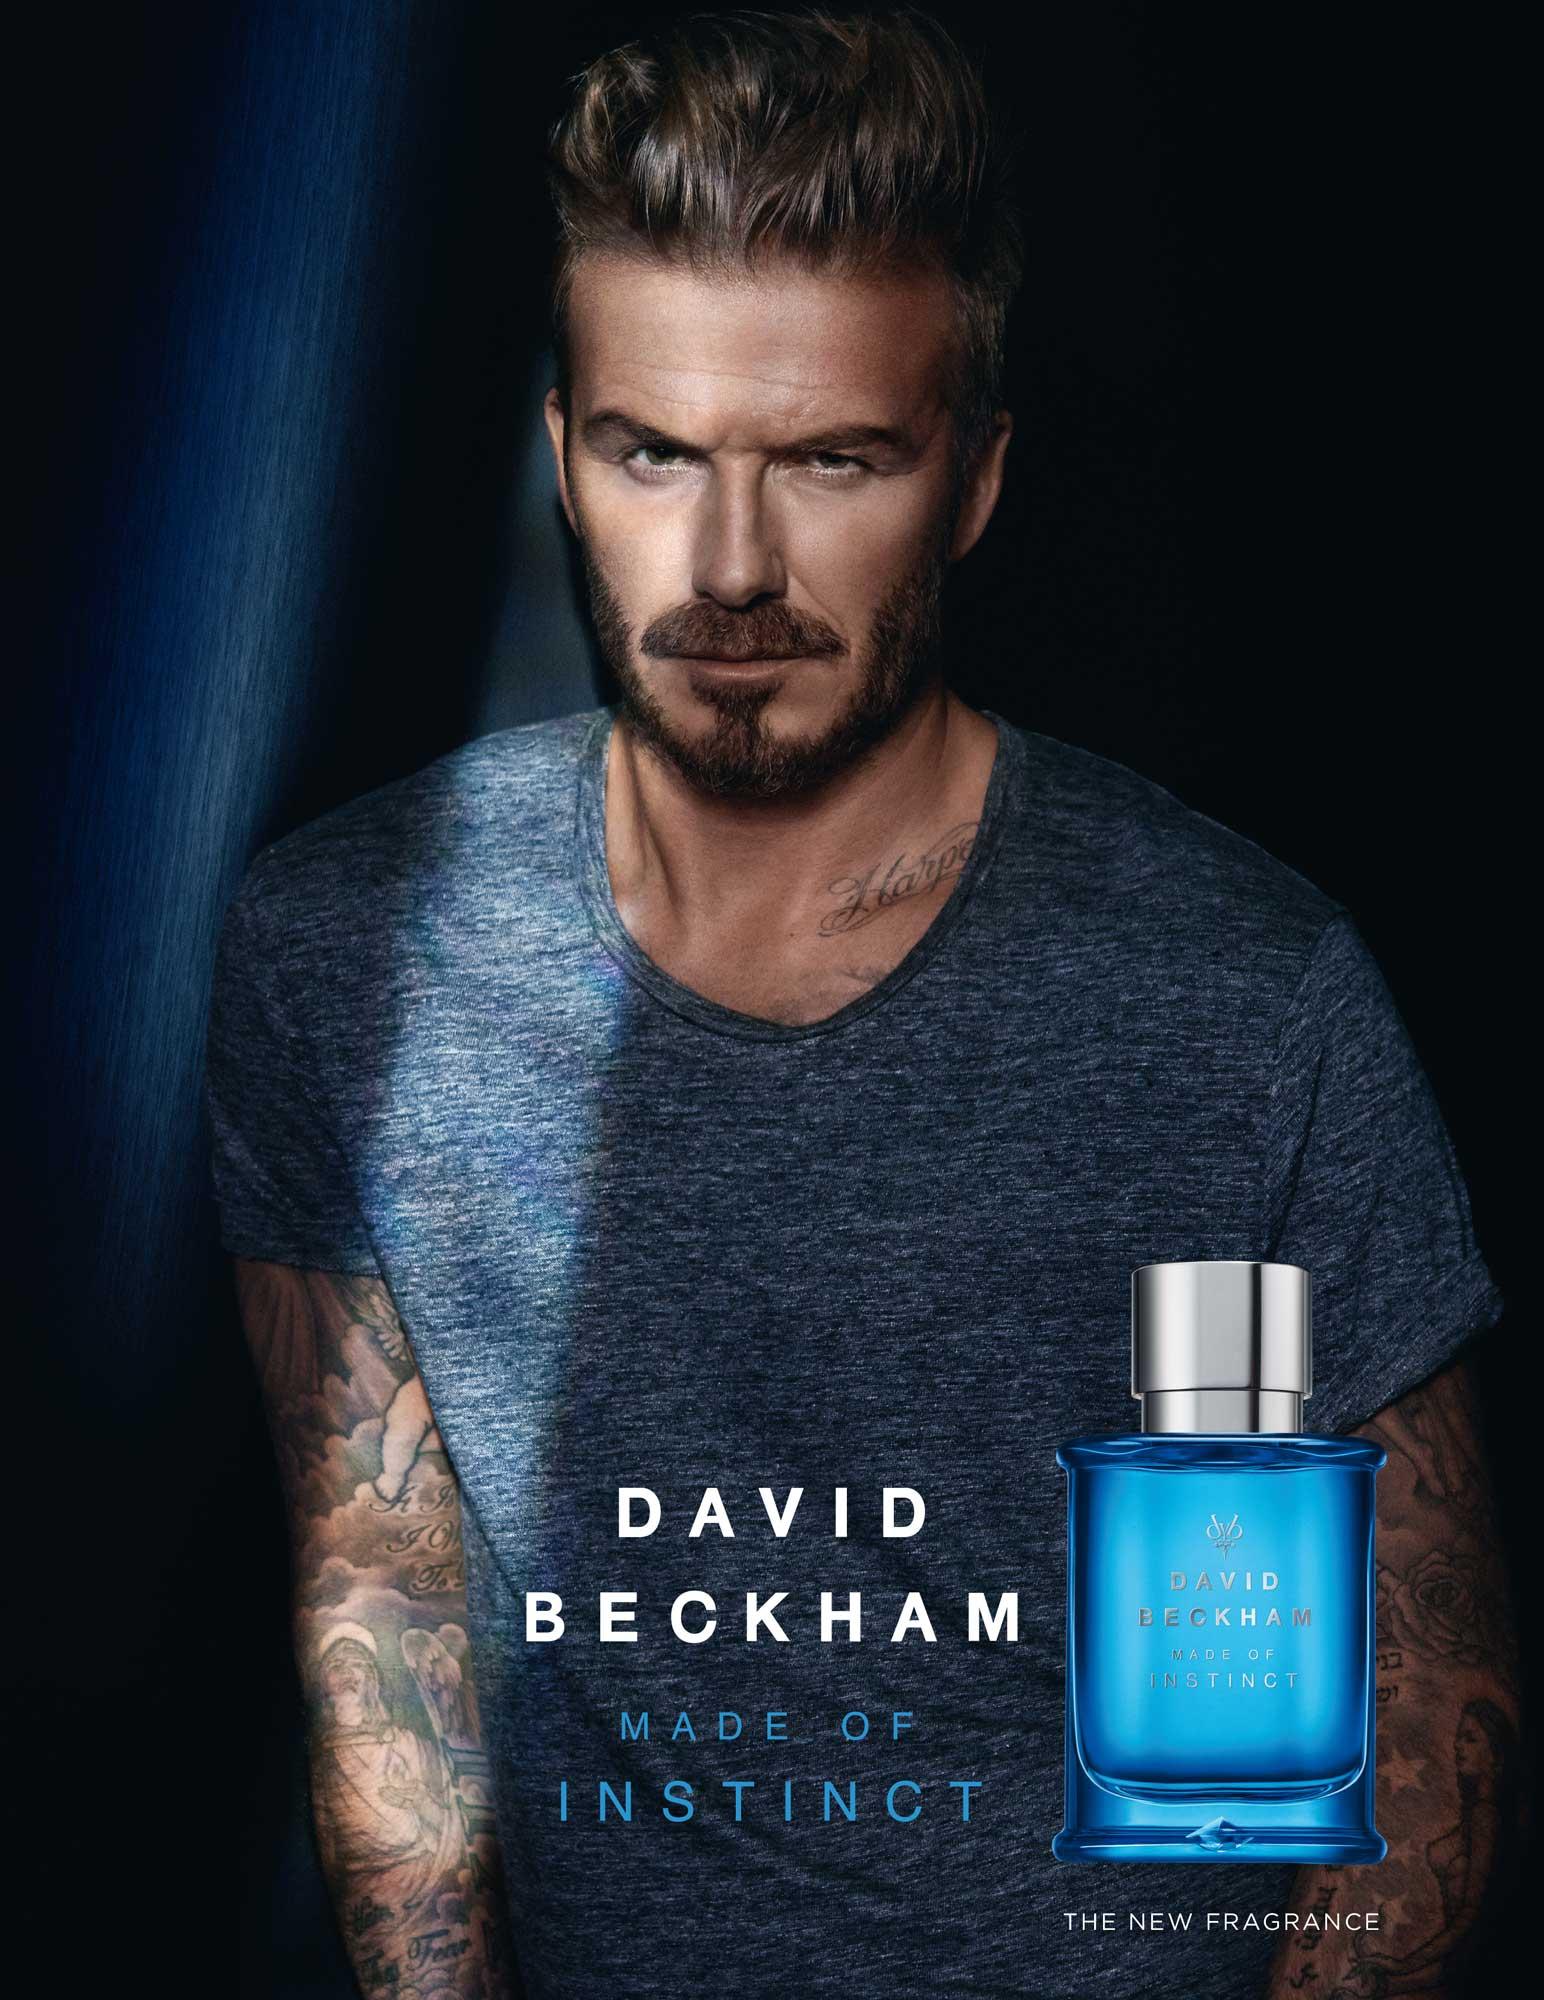 Made of Instinct David Beckham cologne - a new fragrance ...